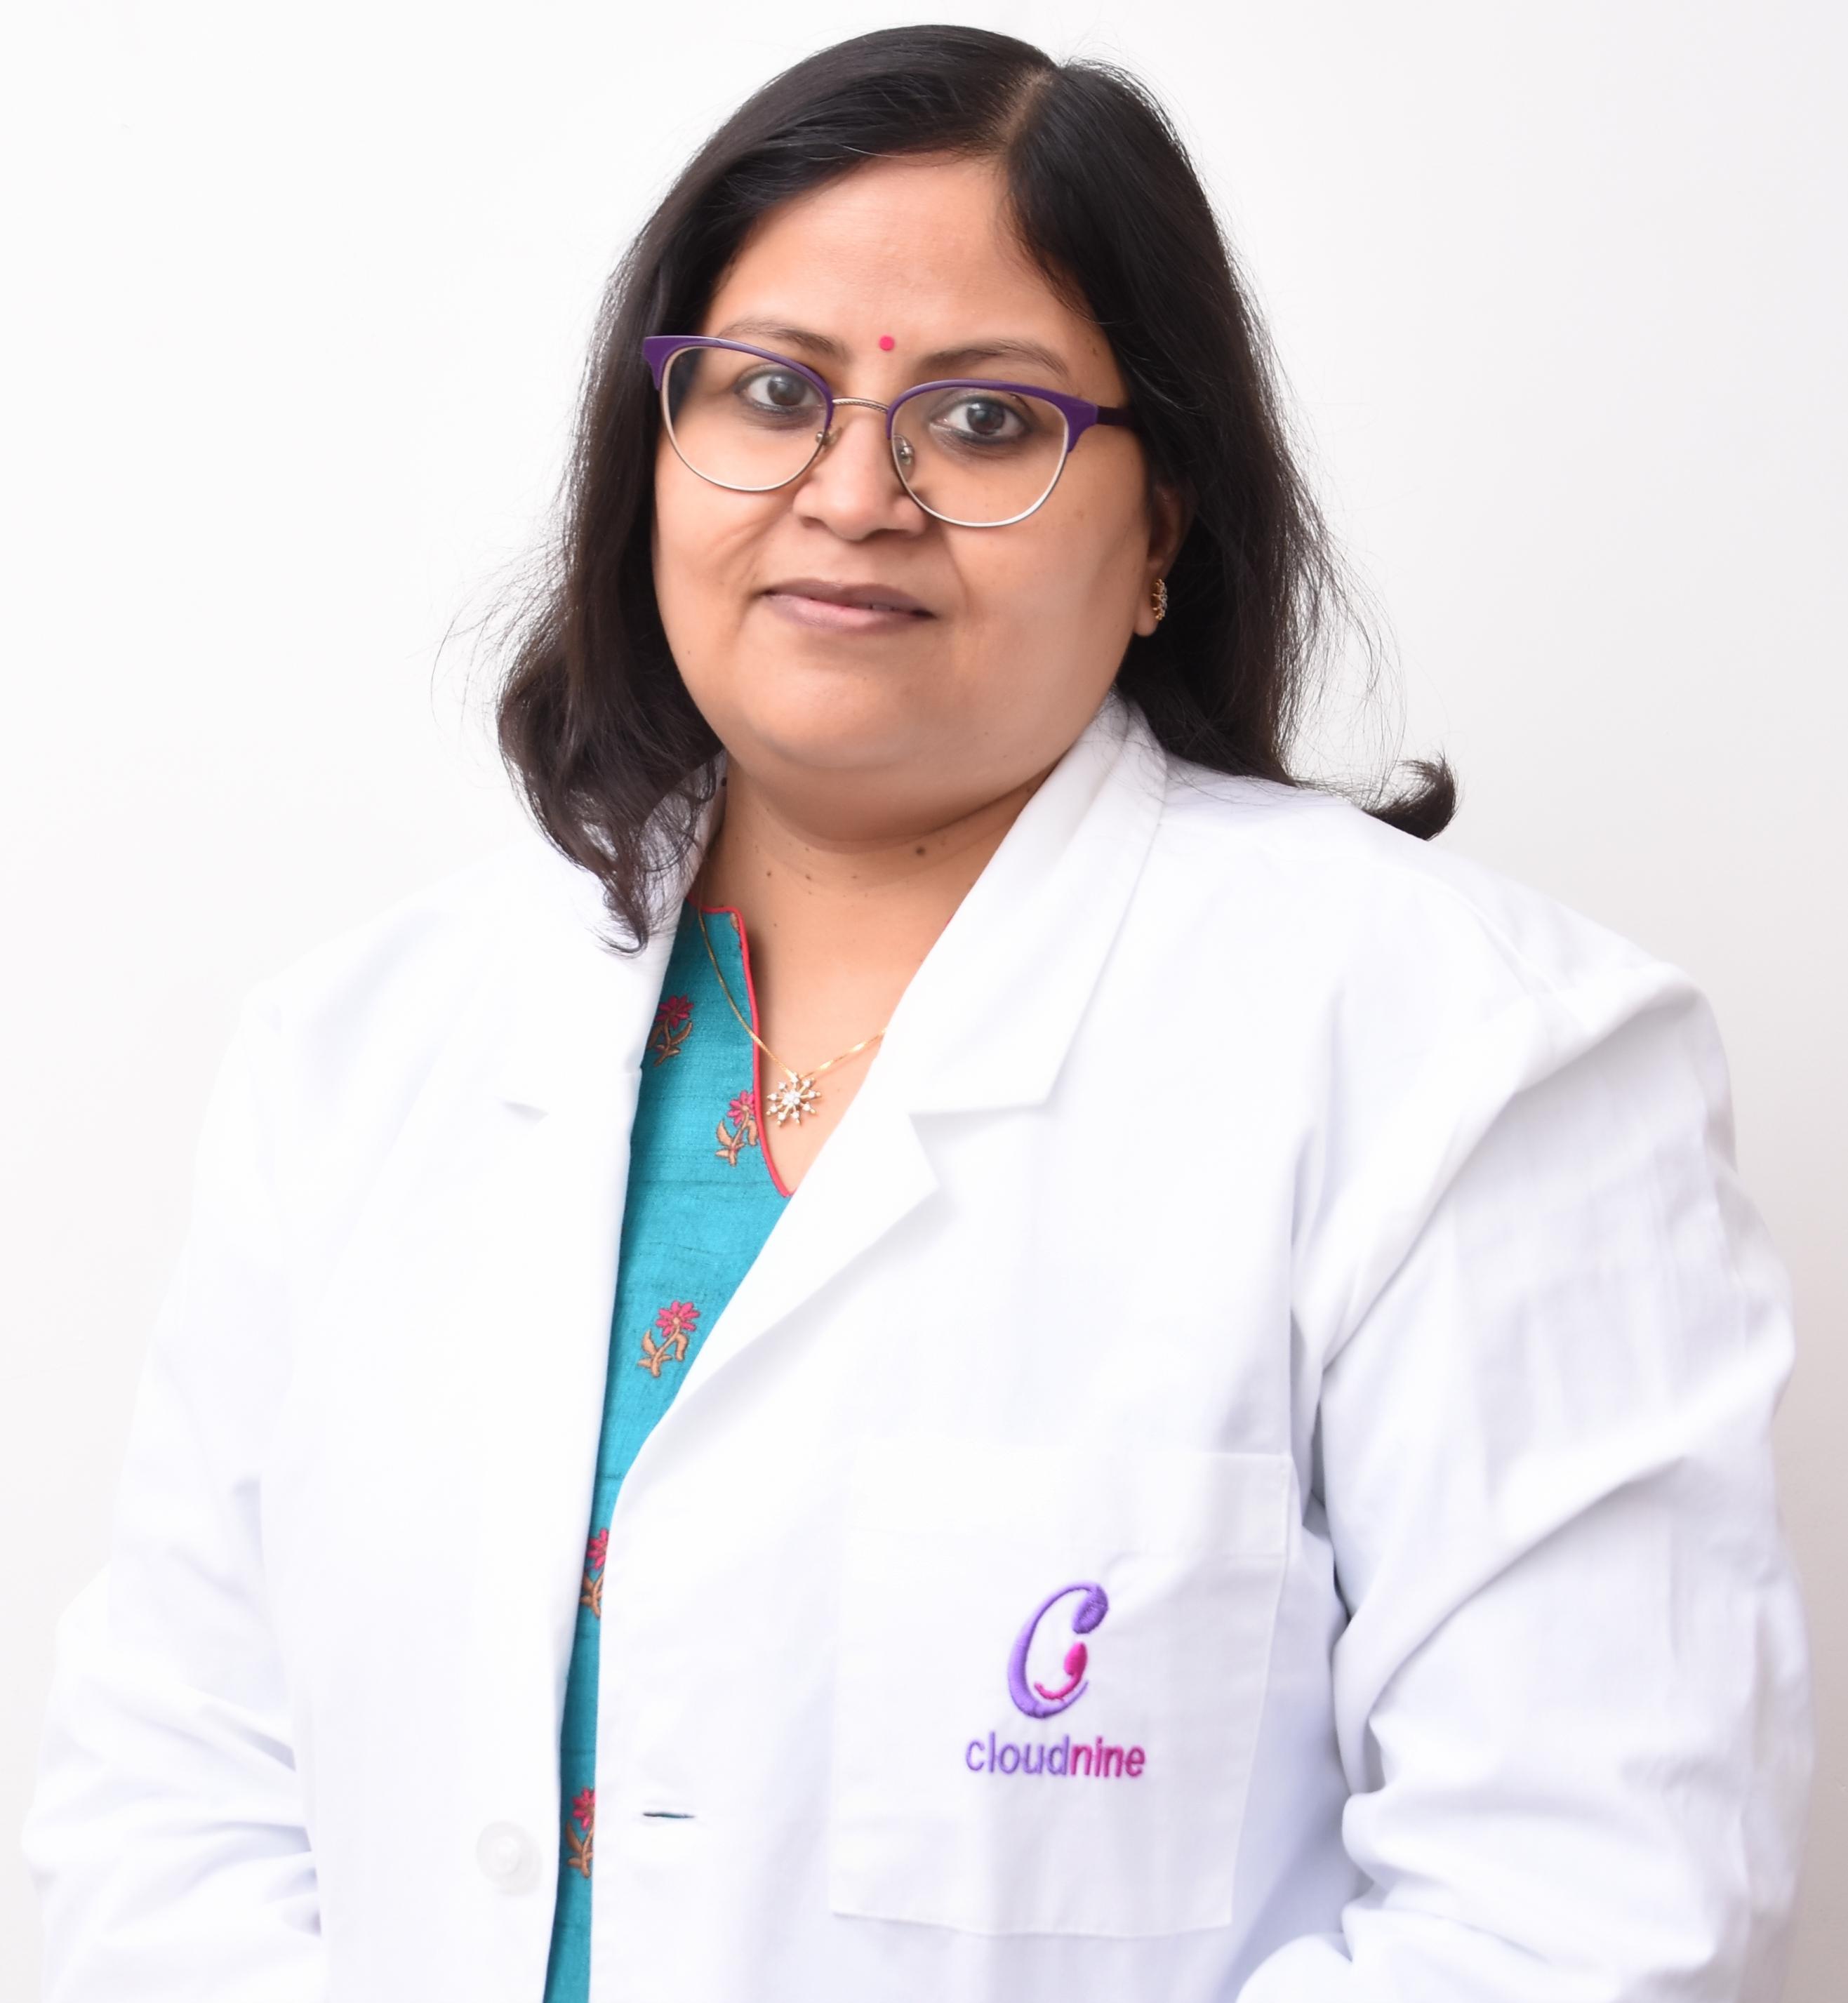 Dr. Rashmi Chaudhary